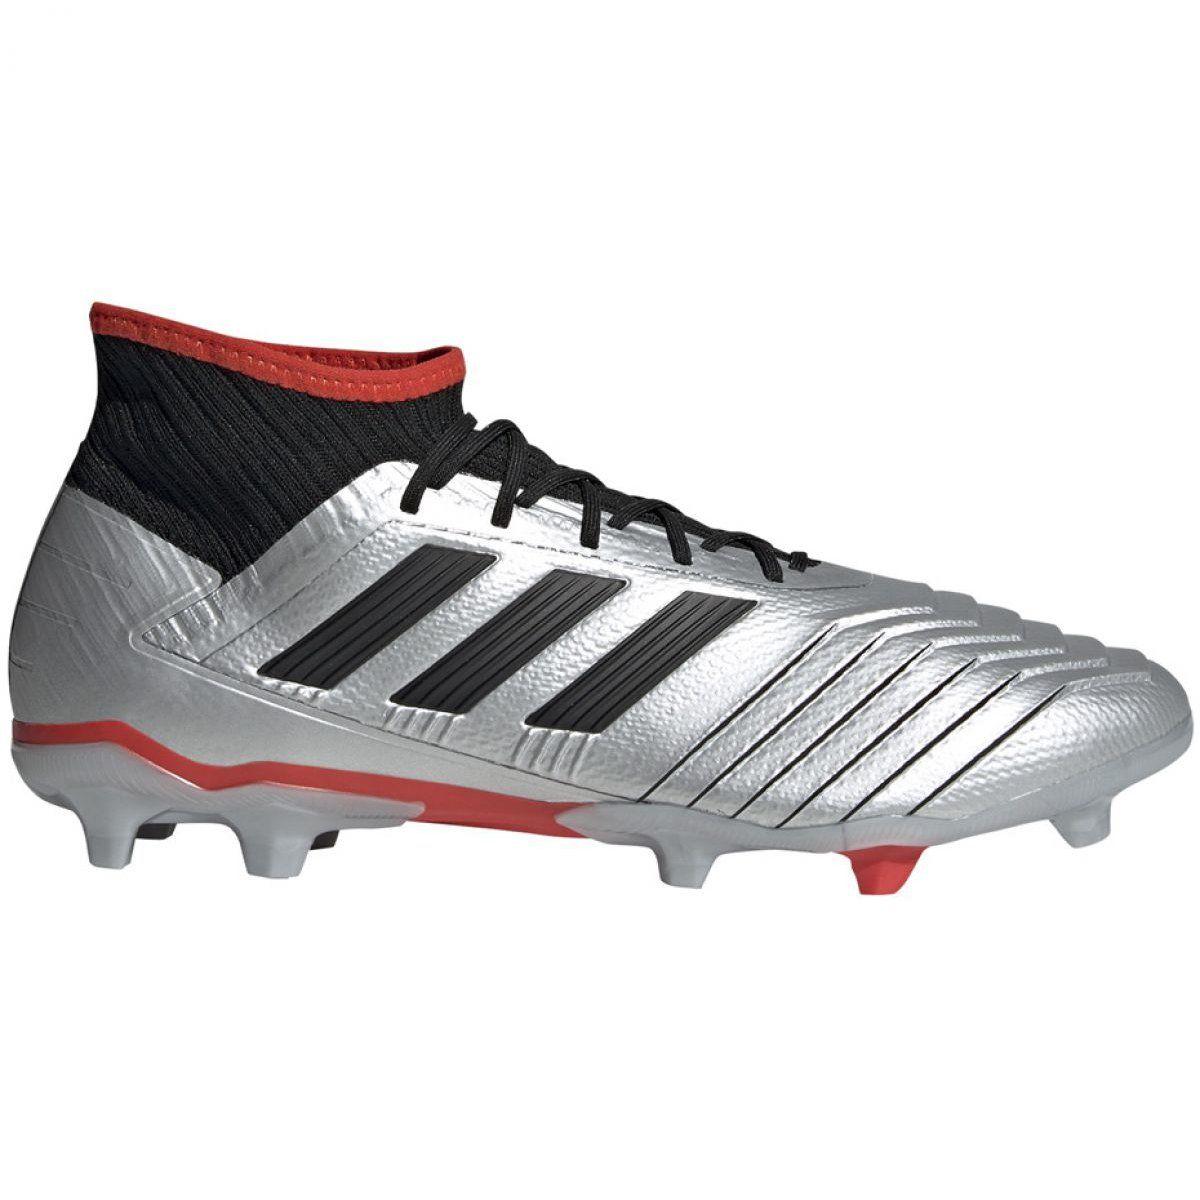 Buty Pilkarskie Adidas Predator 19 2 Fg M F35601 Czarny Srebrny Srebrny Adidas Predator Adidas Football Boots